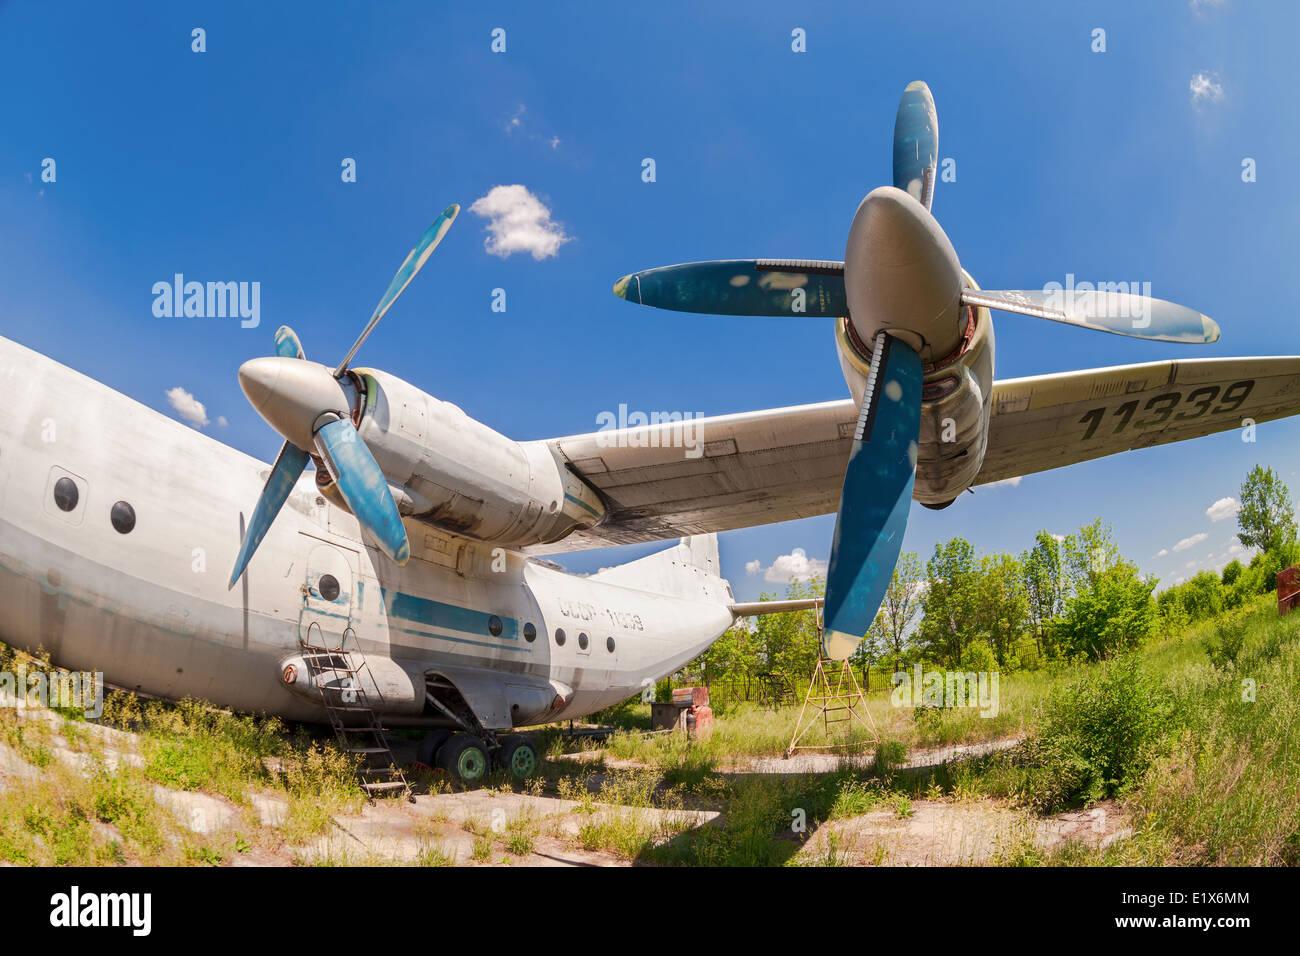 Old russian aircraft An-12 at an abandoned aerodrome - Stock Image